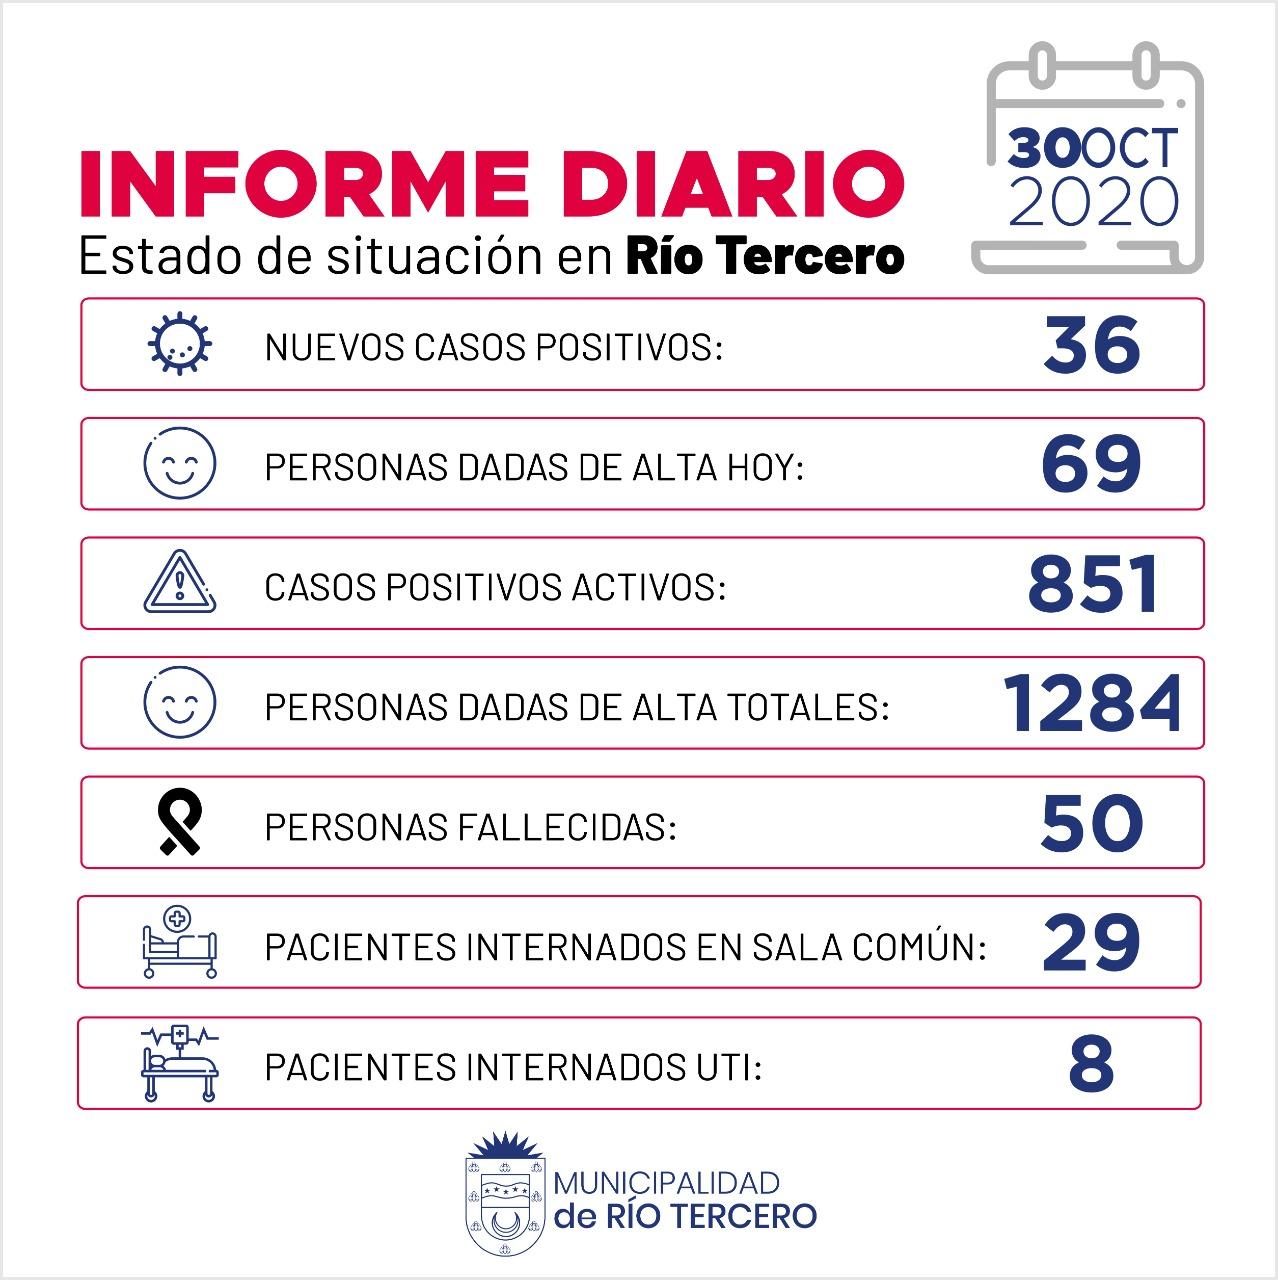 CORONAVIRUS: RÍO TERCERO SE REGISTRARON 36 NUEVOS CASOS POSITIVOS